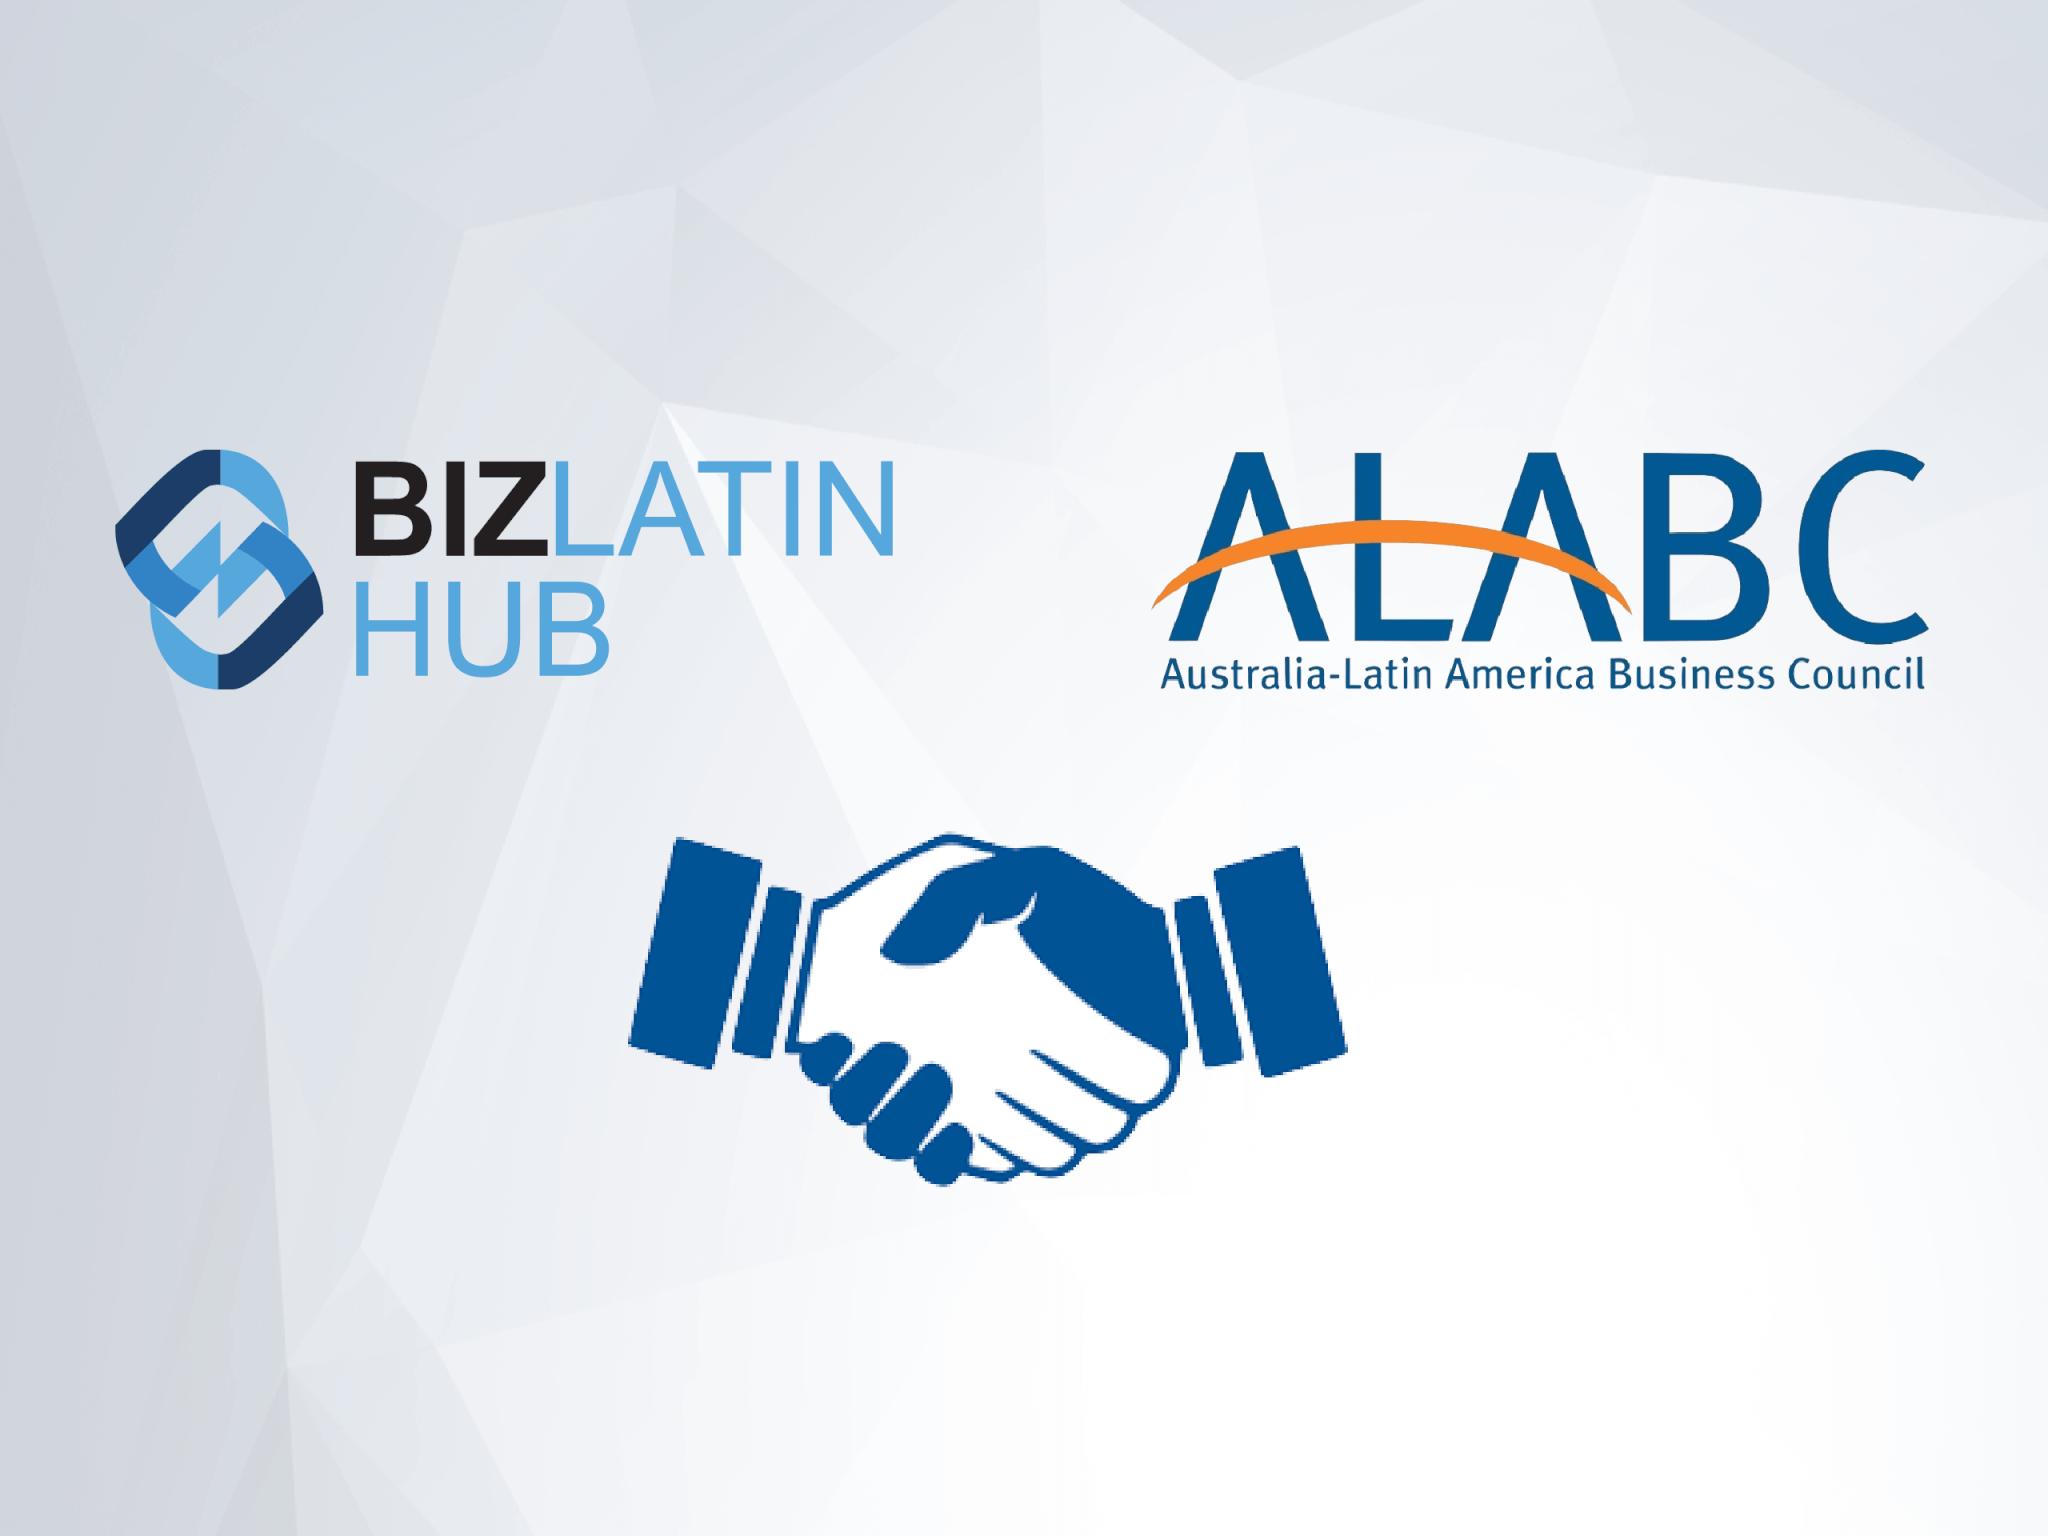 BLH & ALABC Unite: Increased Business TiesBetweenAustralia and Latin America